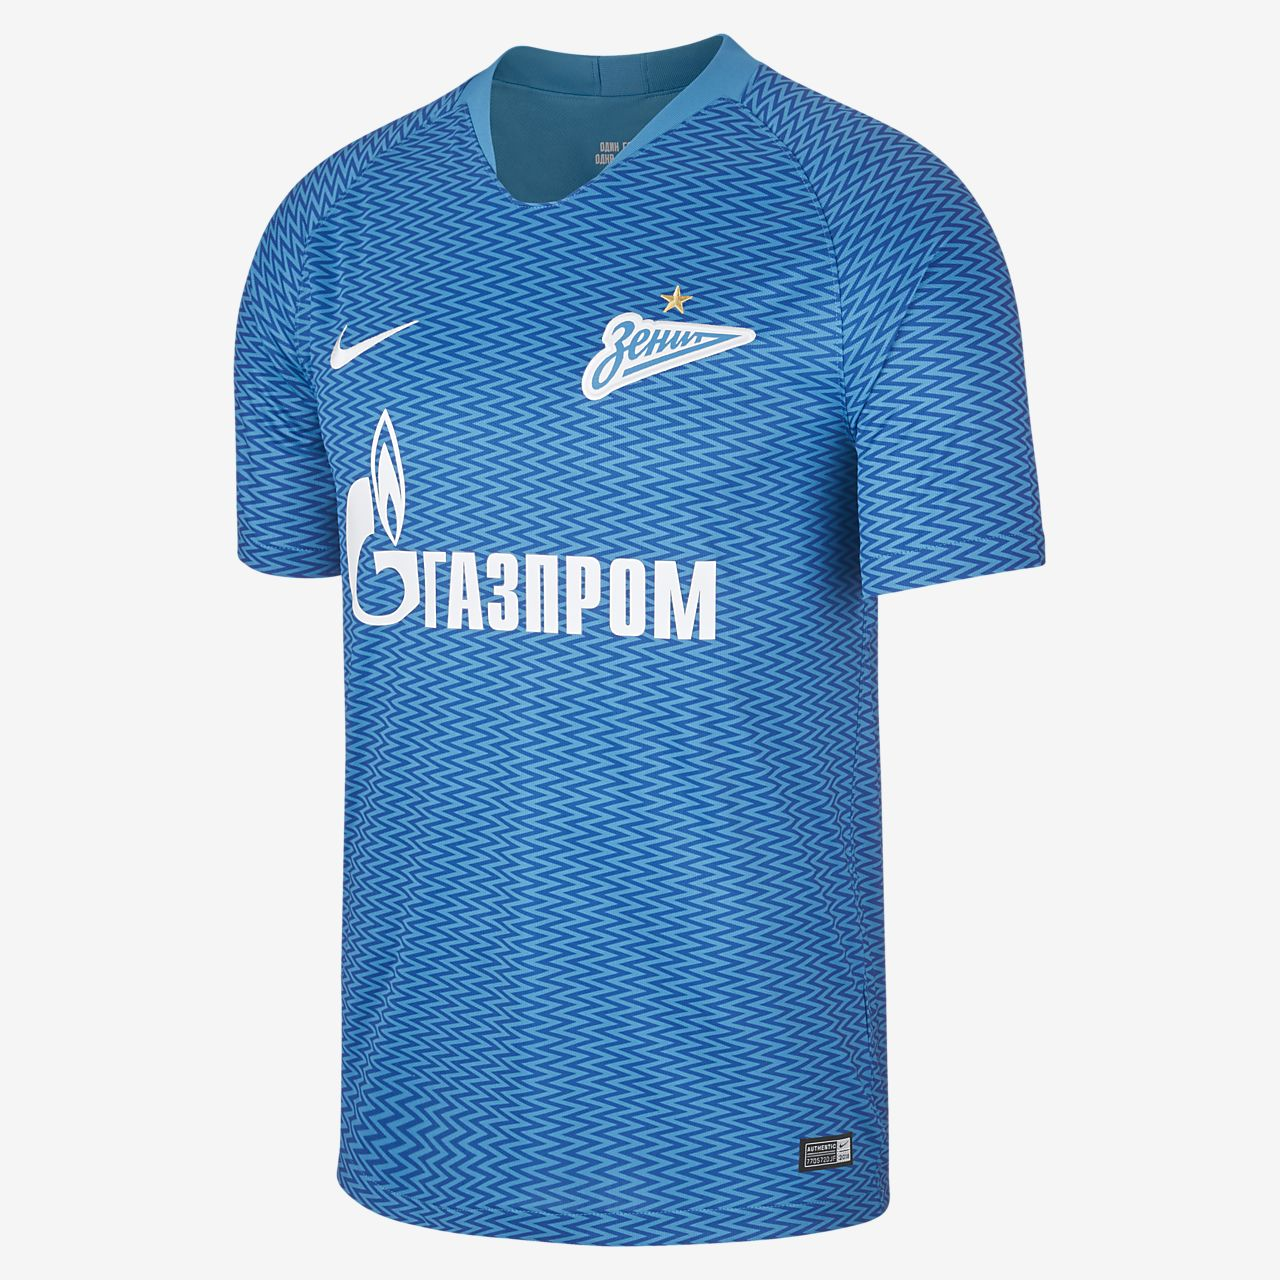 c66aa2f5ea8 2018 19 FC Zenit Stadium Home Men s Football Shirt. Nike.com AU